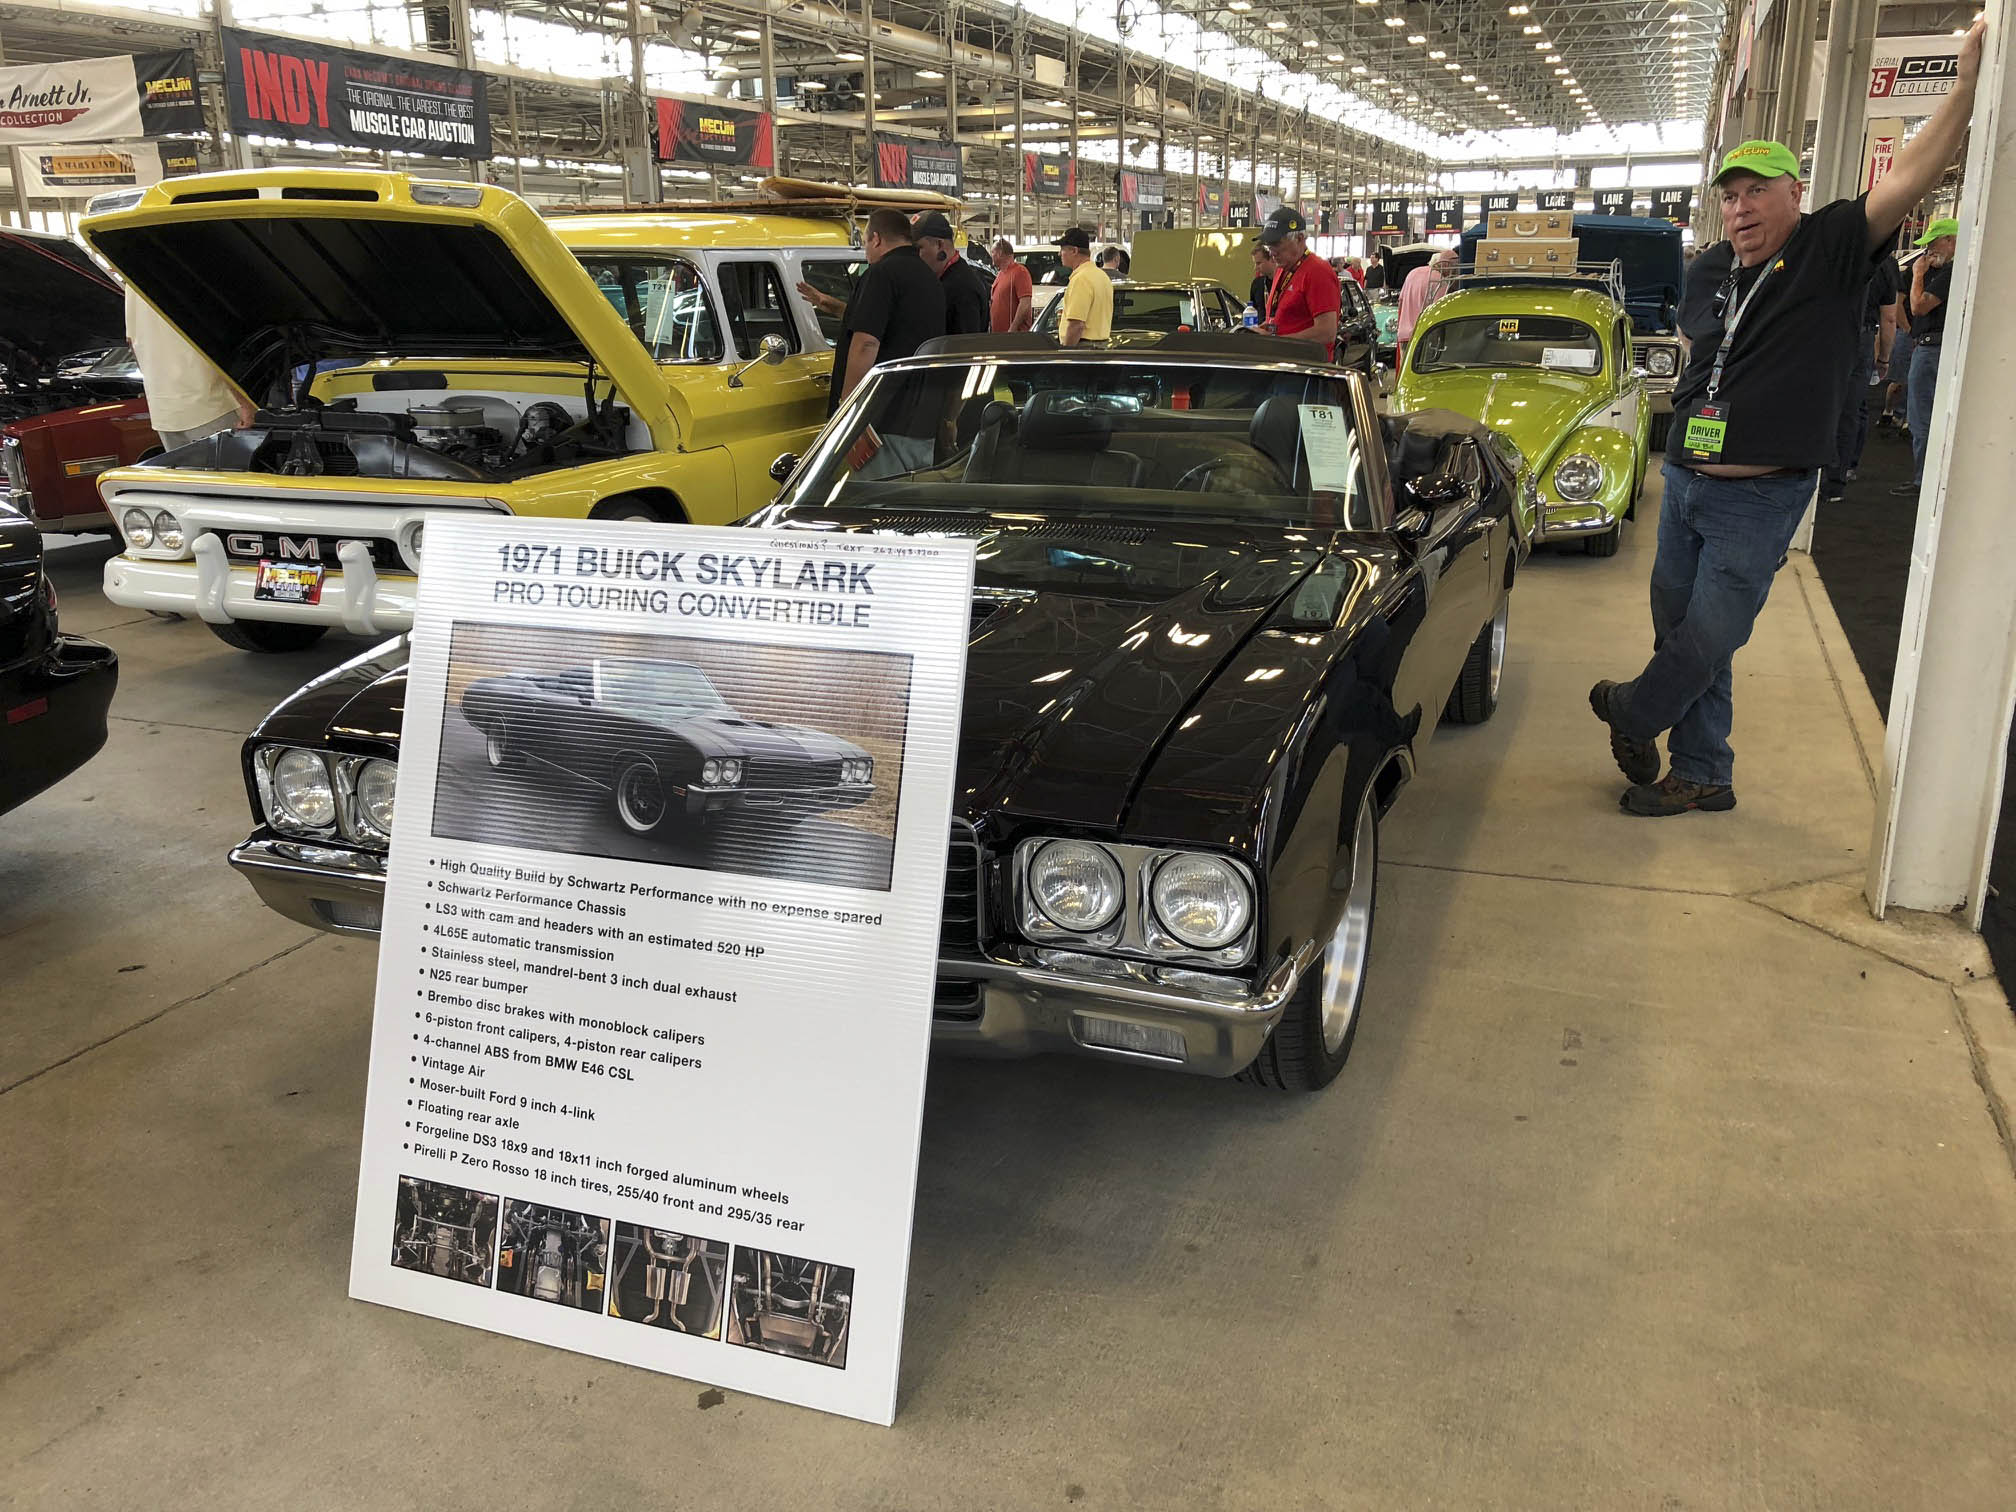 1971 Buick Skylark pro touring convertible